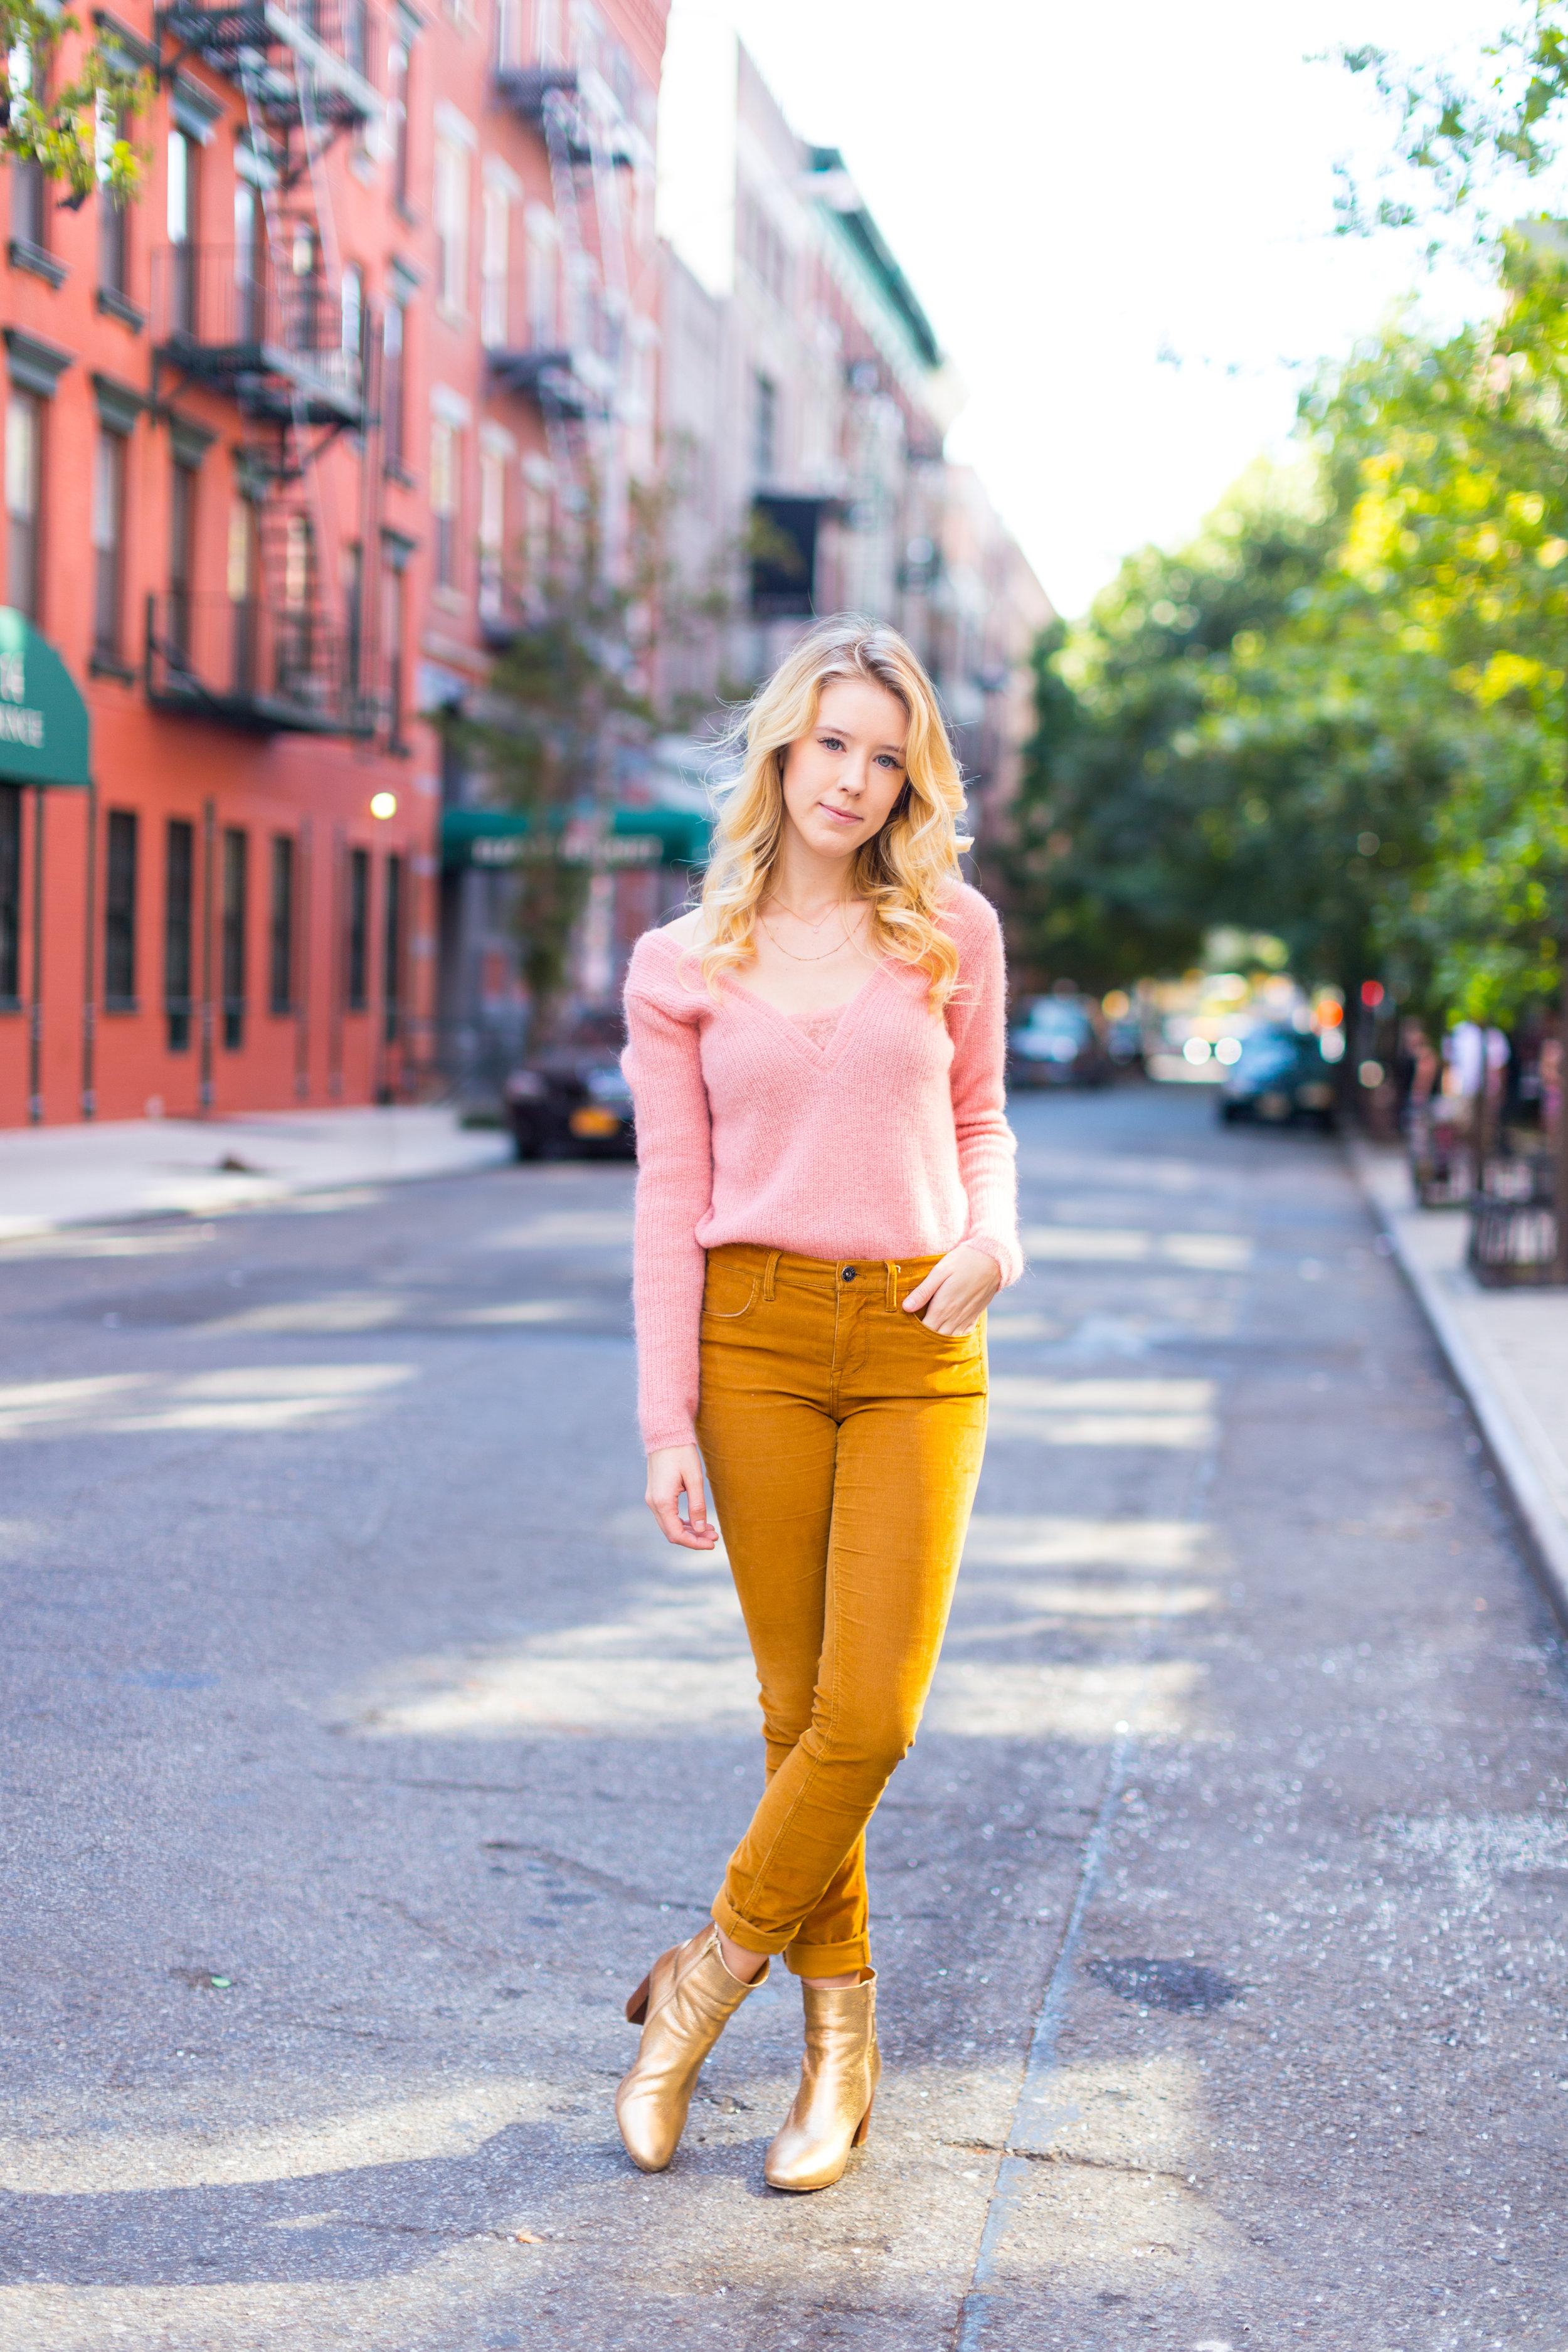 Fall Fashion Pink Sweater and Gold Pants.jpg